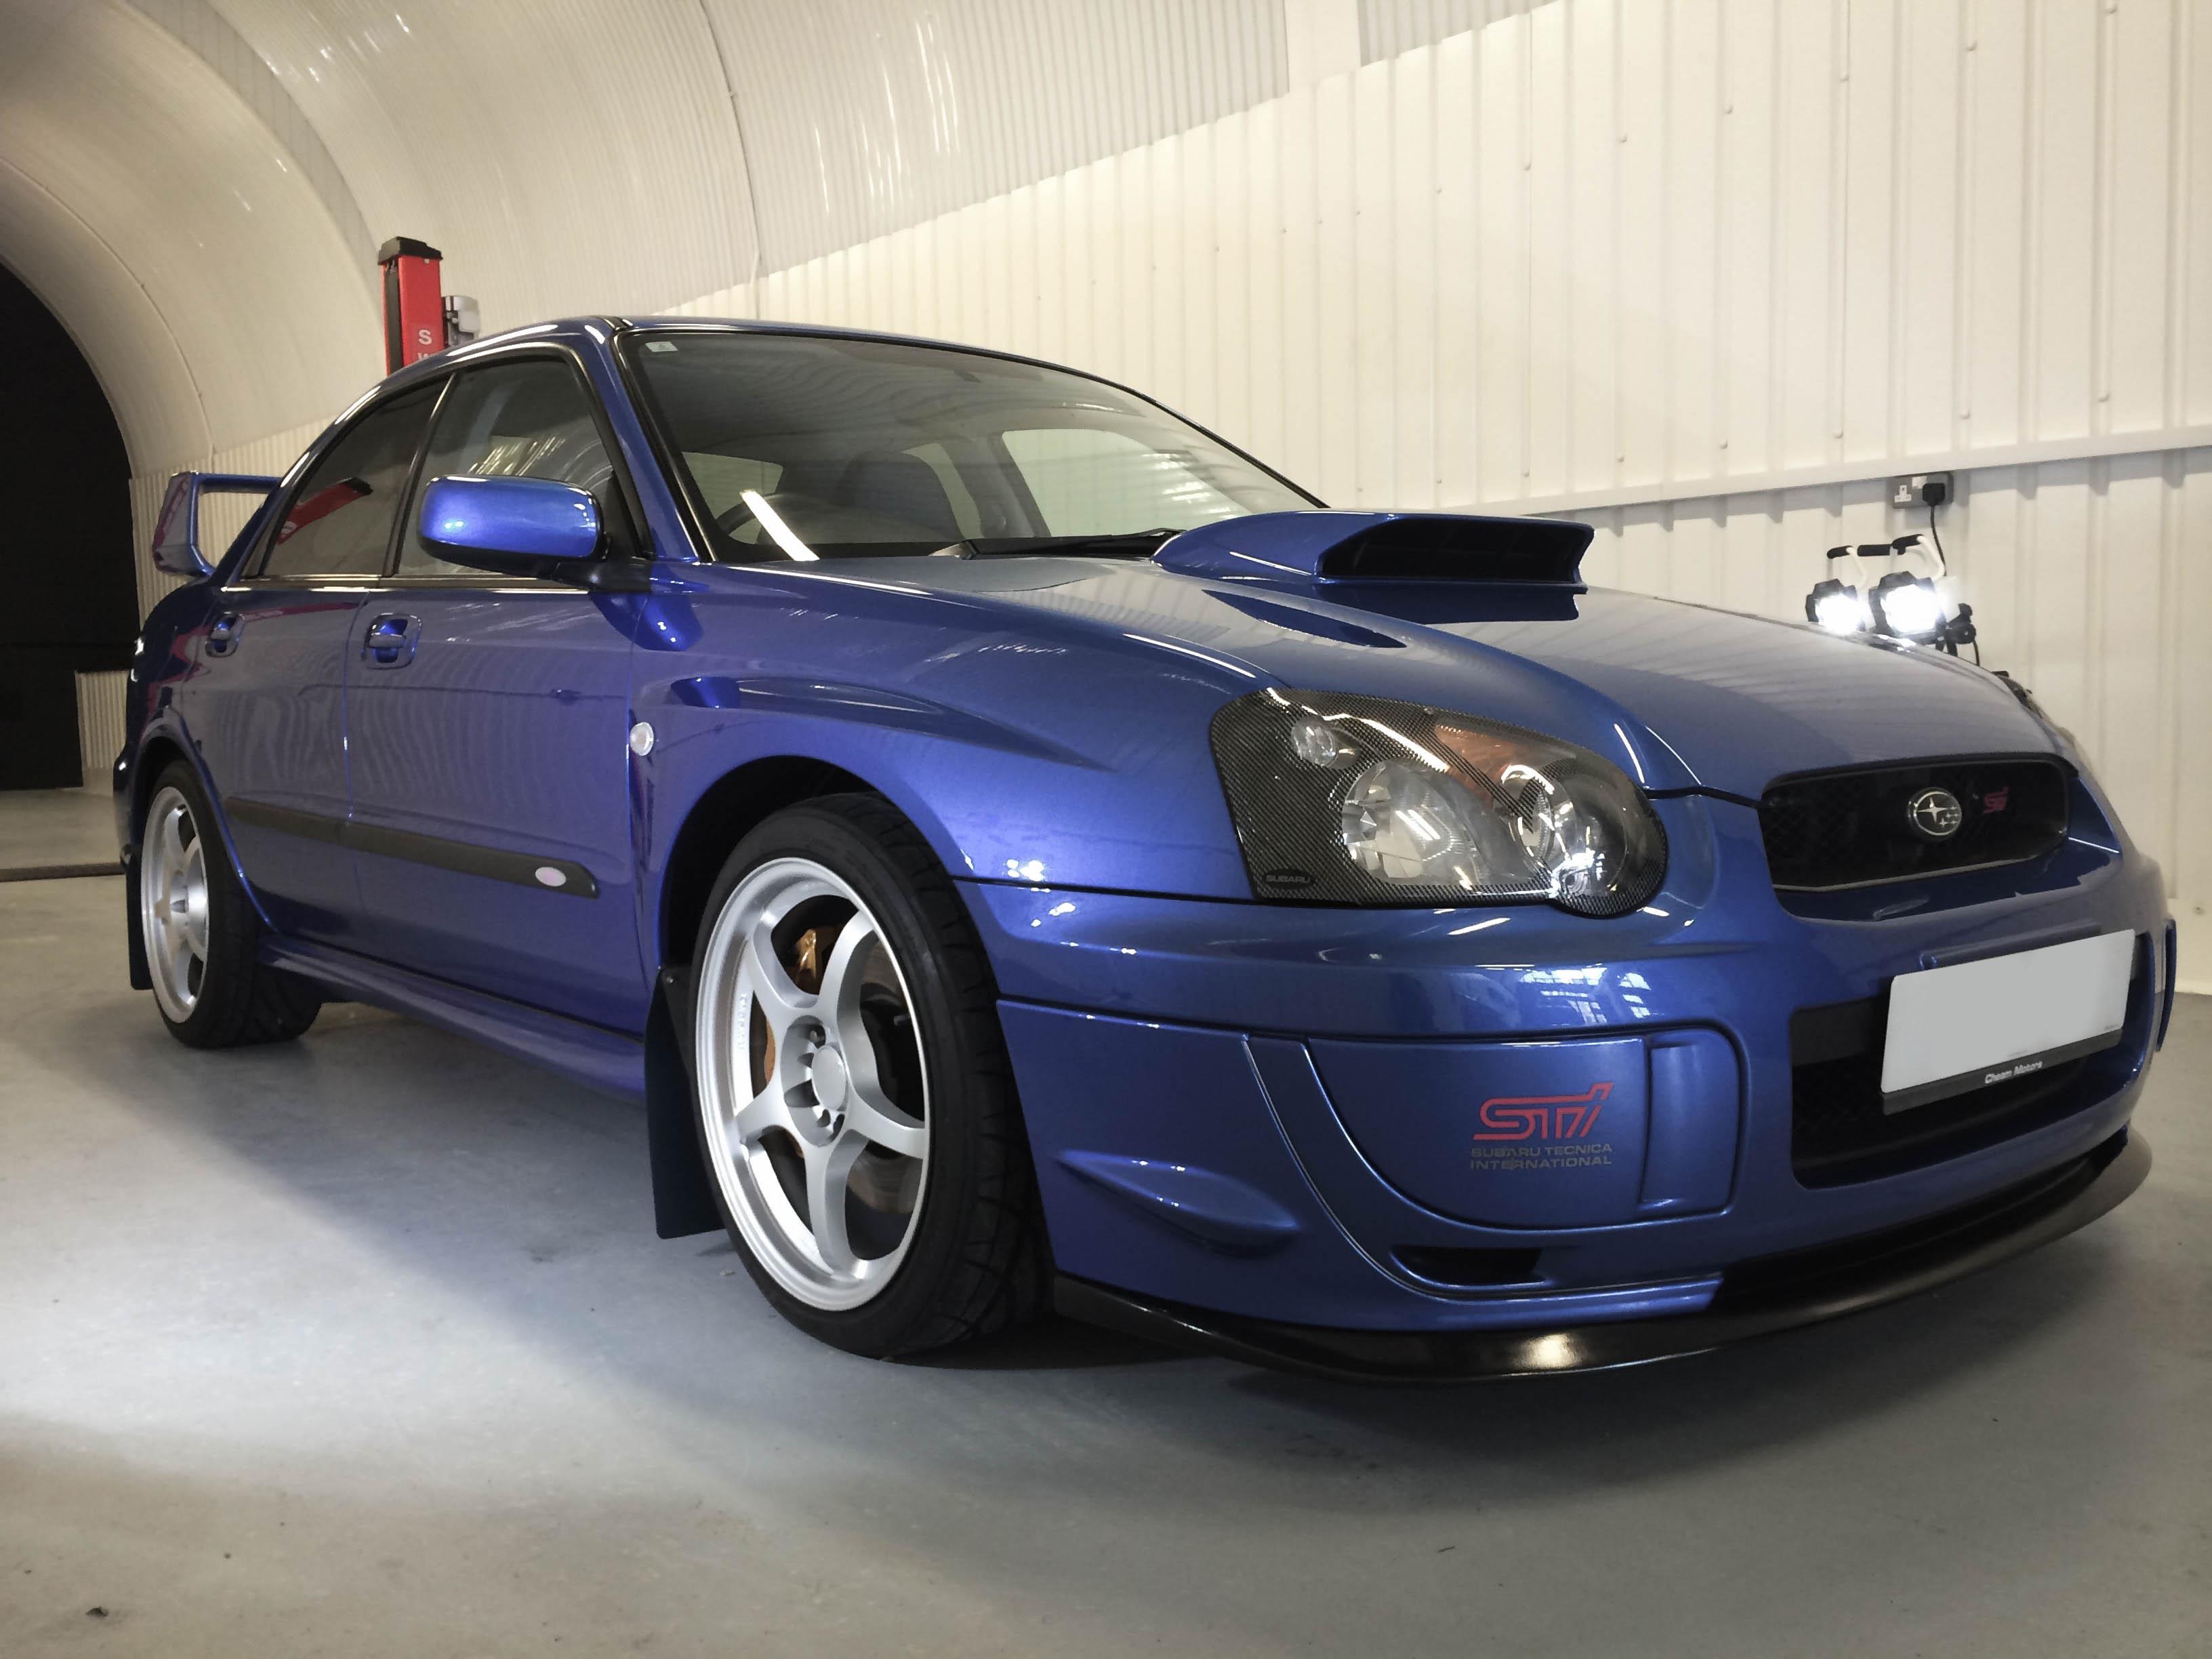 Subaru-Impreza-WRX-threequarters